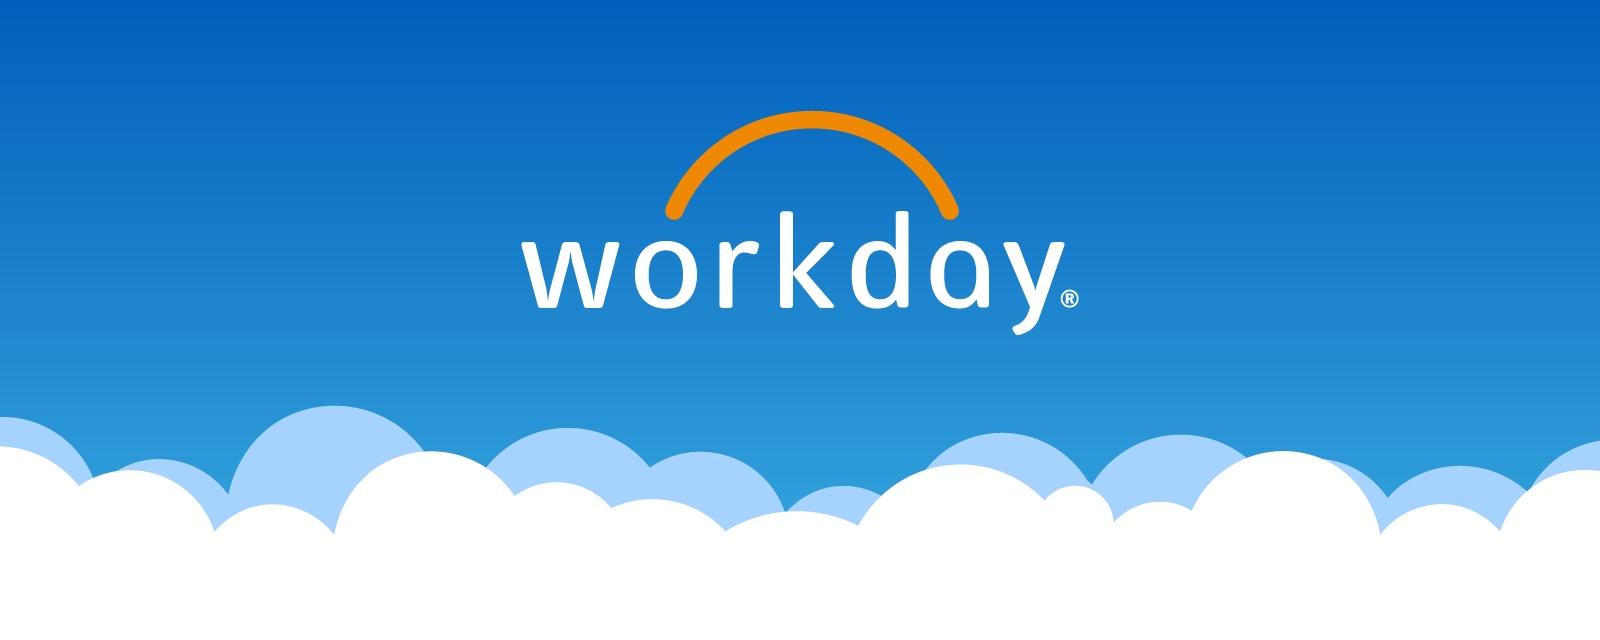 workday-hero-image